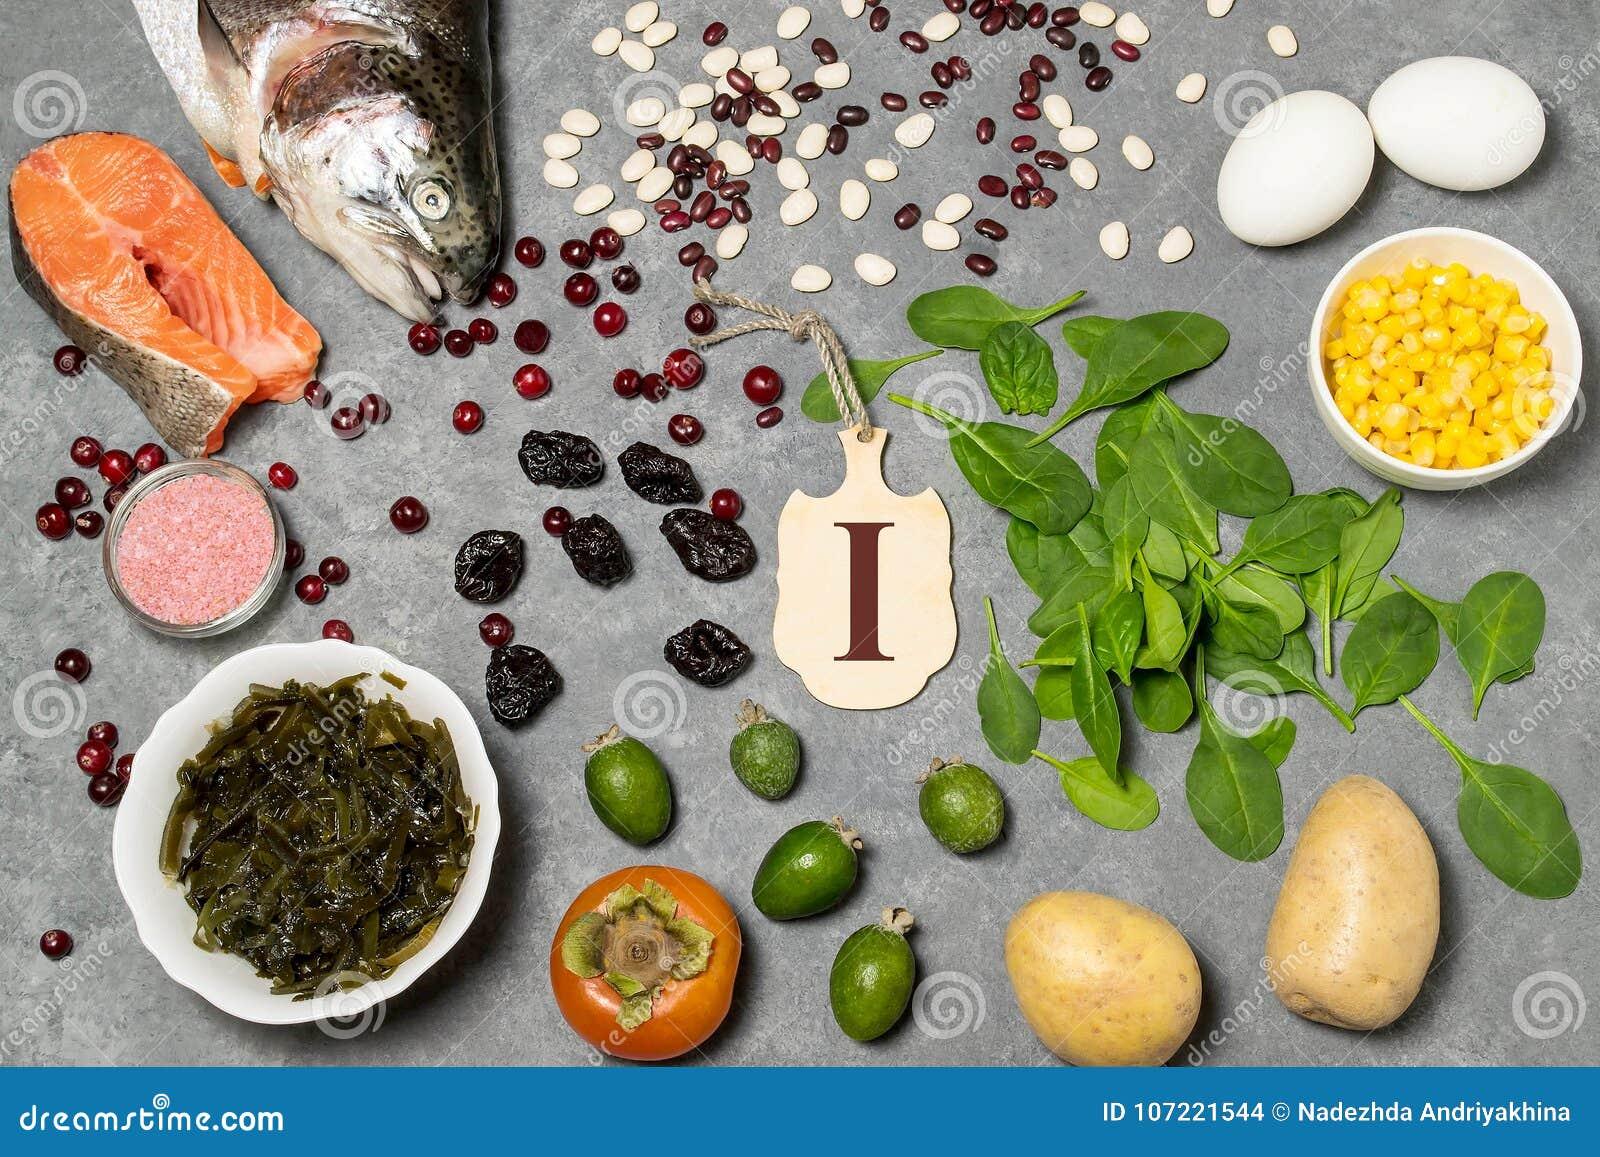 Food is source of iodine